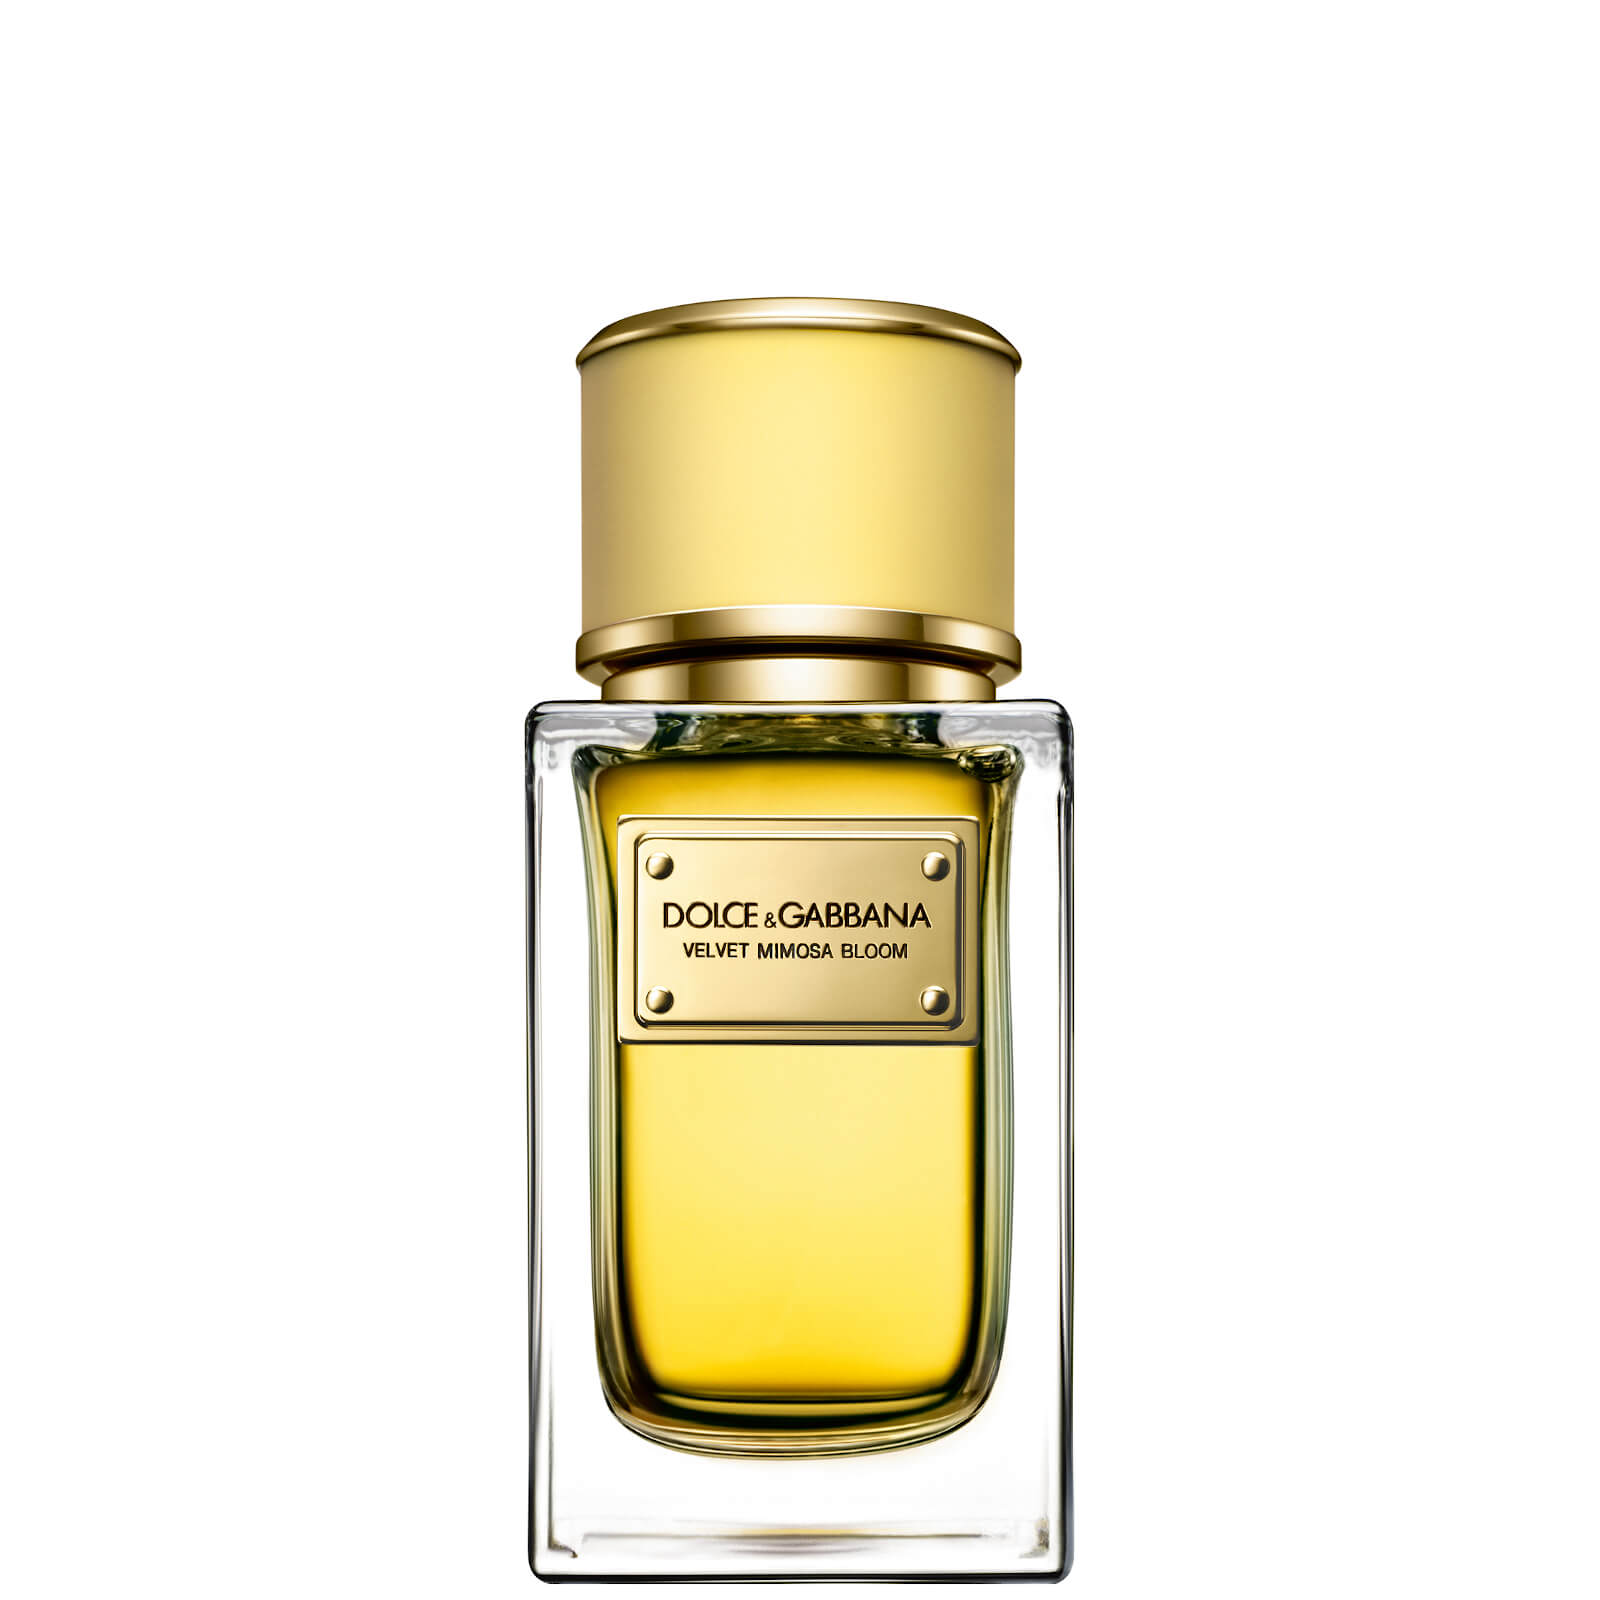 Dolce&Gabbana Velvet Mimosa Bloom Eau de Parfum 50ml